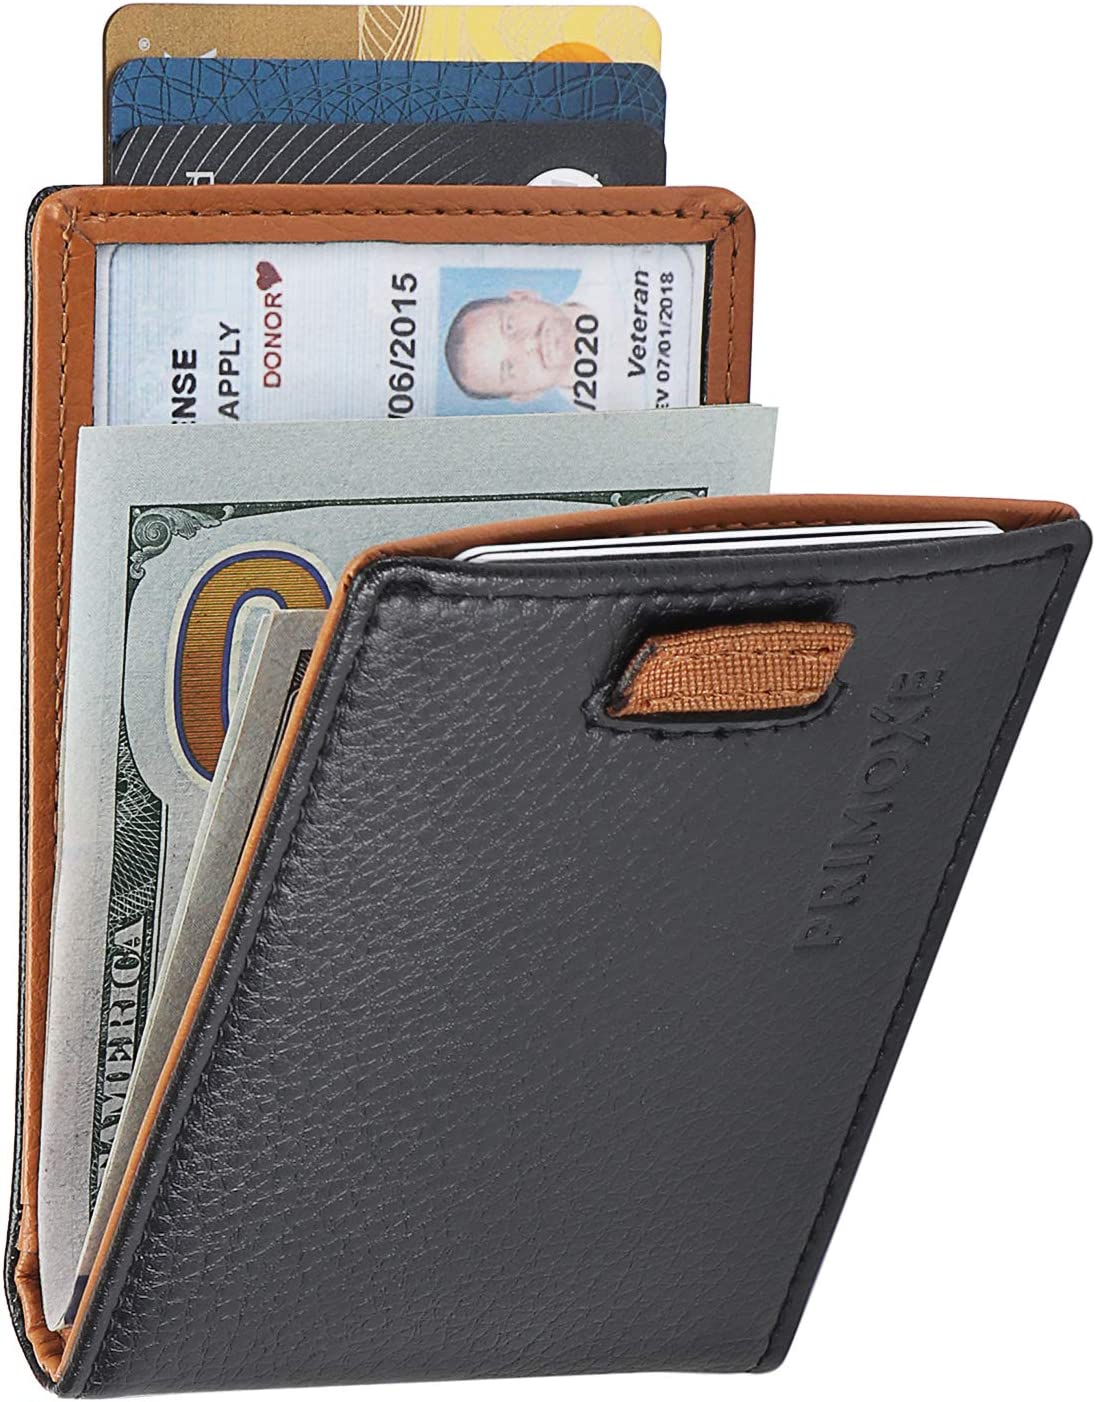 Minimalist Money Card Holder Long wallet Men/'s simple stylish wallet